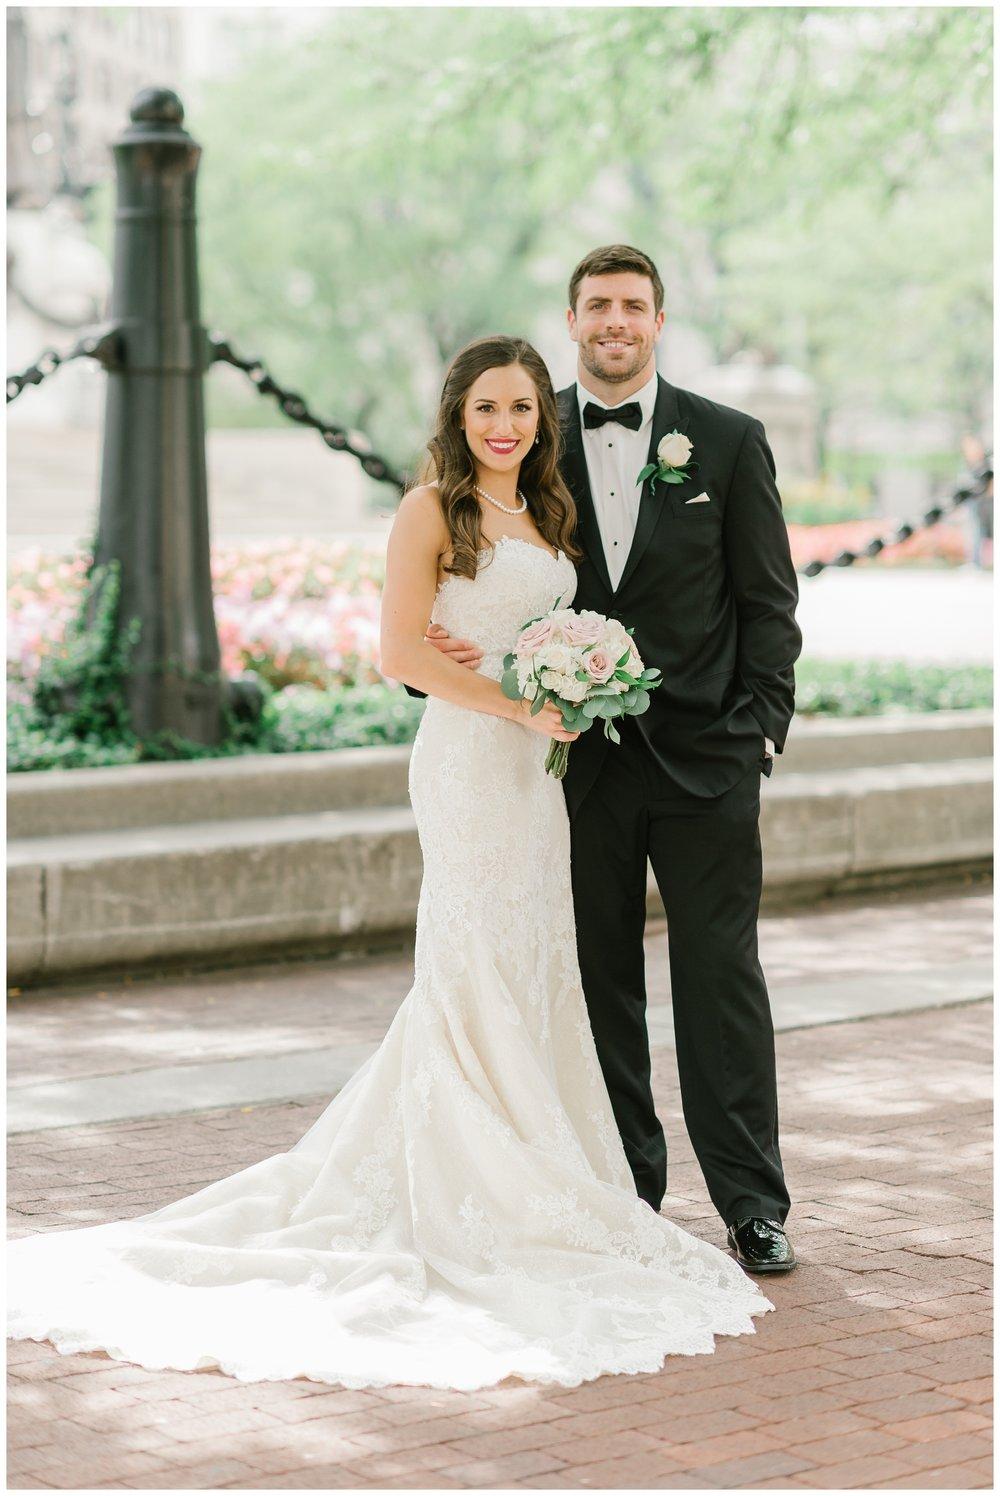 Rebecca_Bridges_Photography_Indianapolis_Wedding_Photographer_6828.jpg